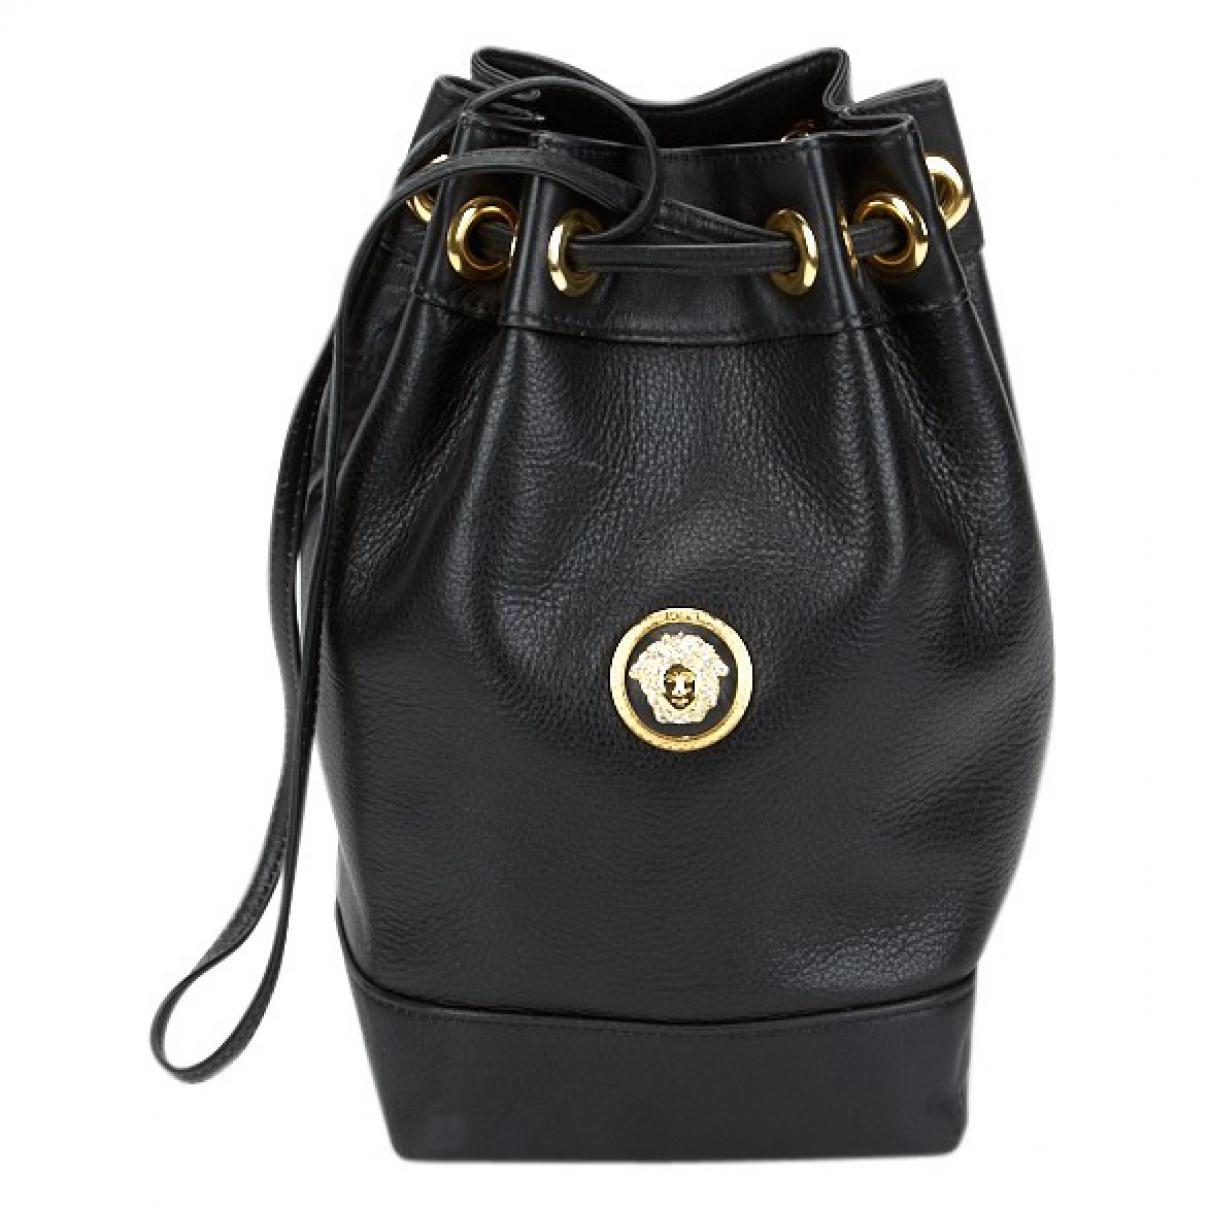 e7ecd9024827 Versace Leather Handbag in Black - Lyst